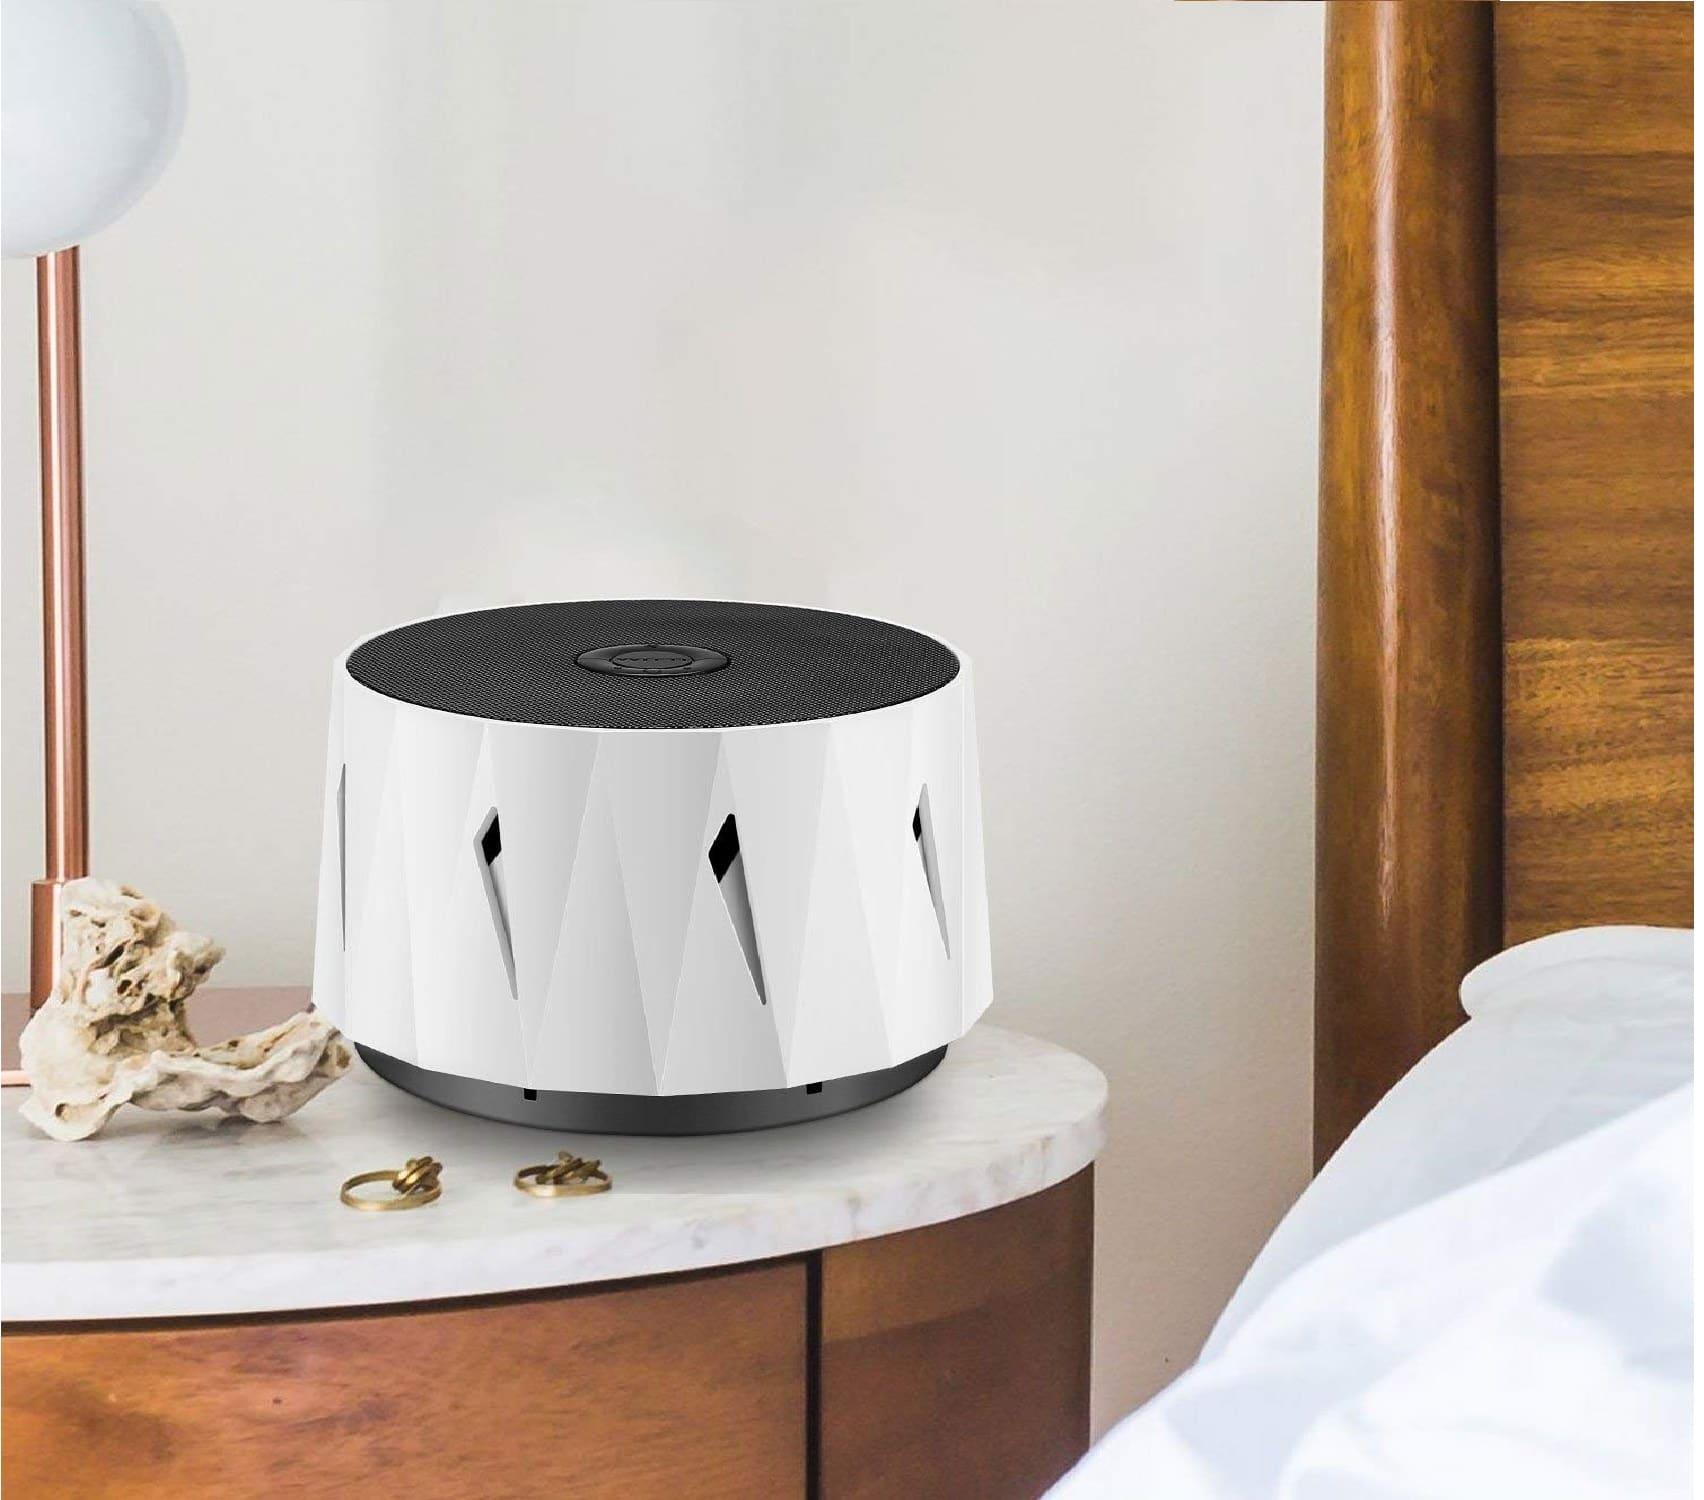 12.WITTI DOZZI White Noise Noise Machine for Baby, Sleeping, Office Privacy. Lightweight Portable for Travel, Hotel Sleep. Natural White Noises maker,